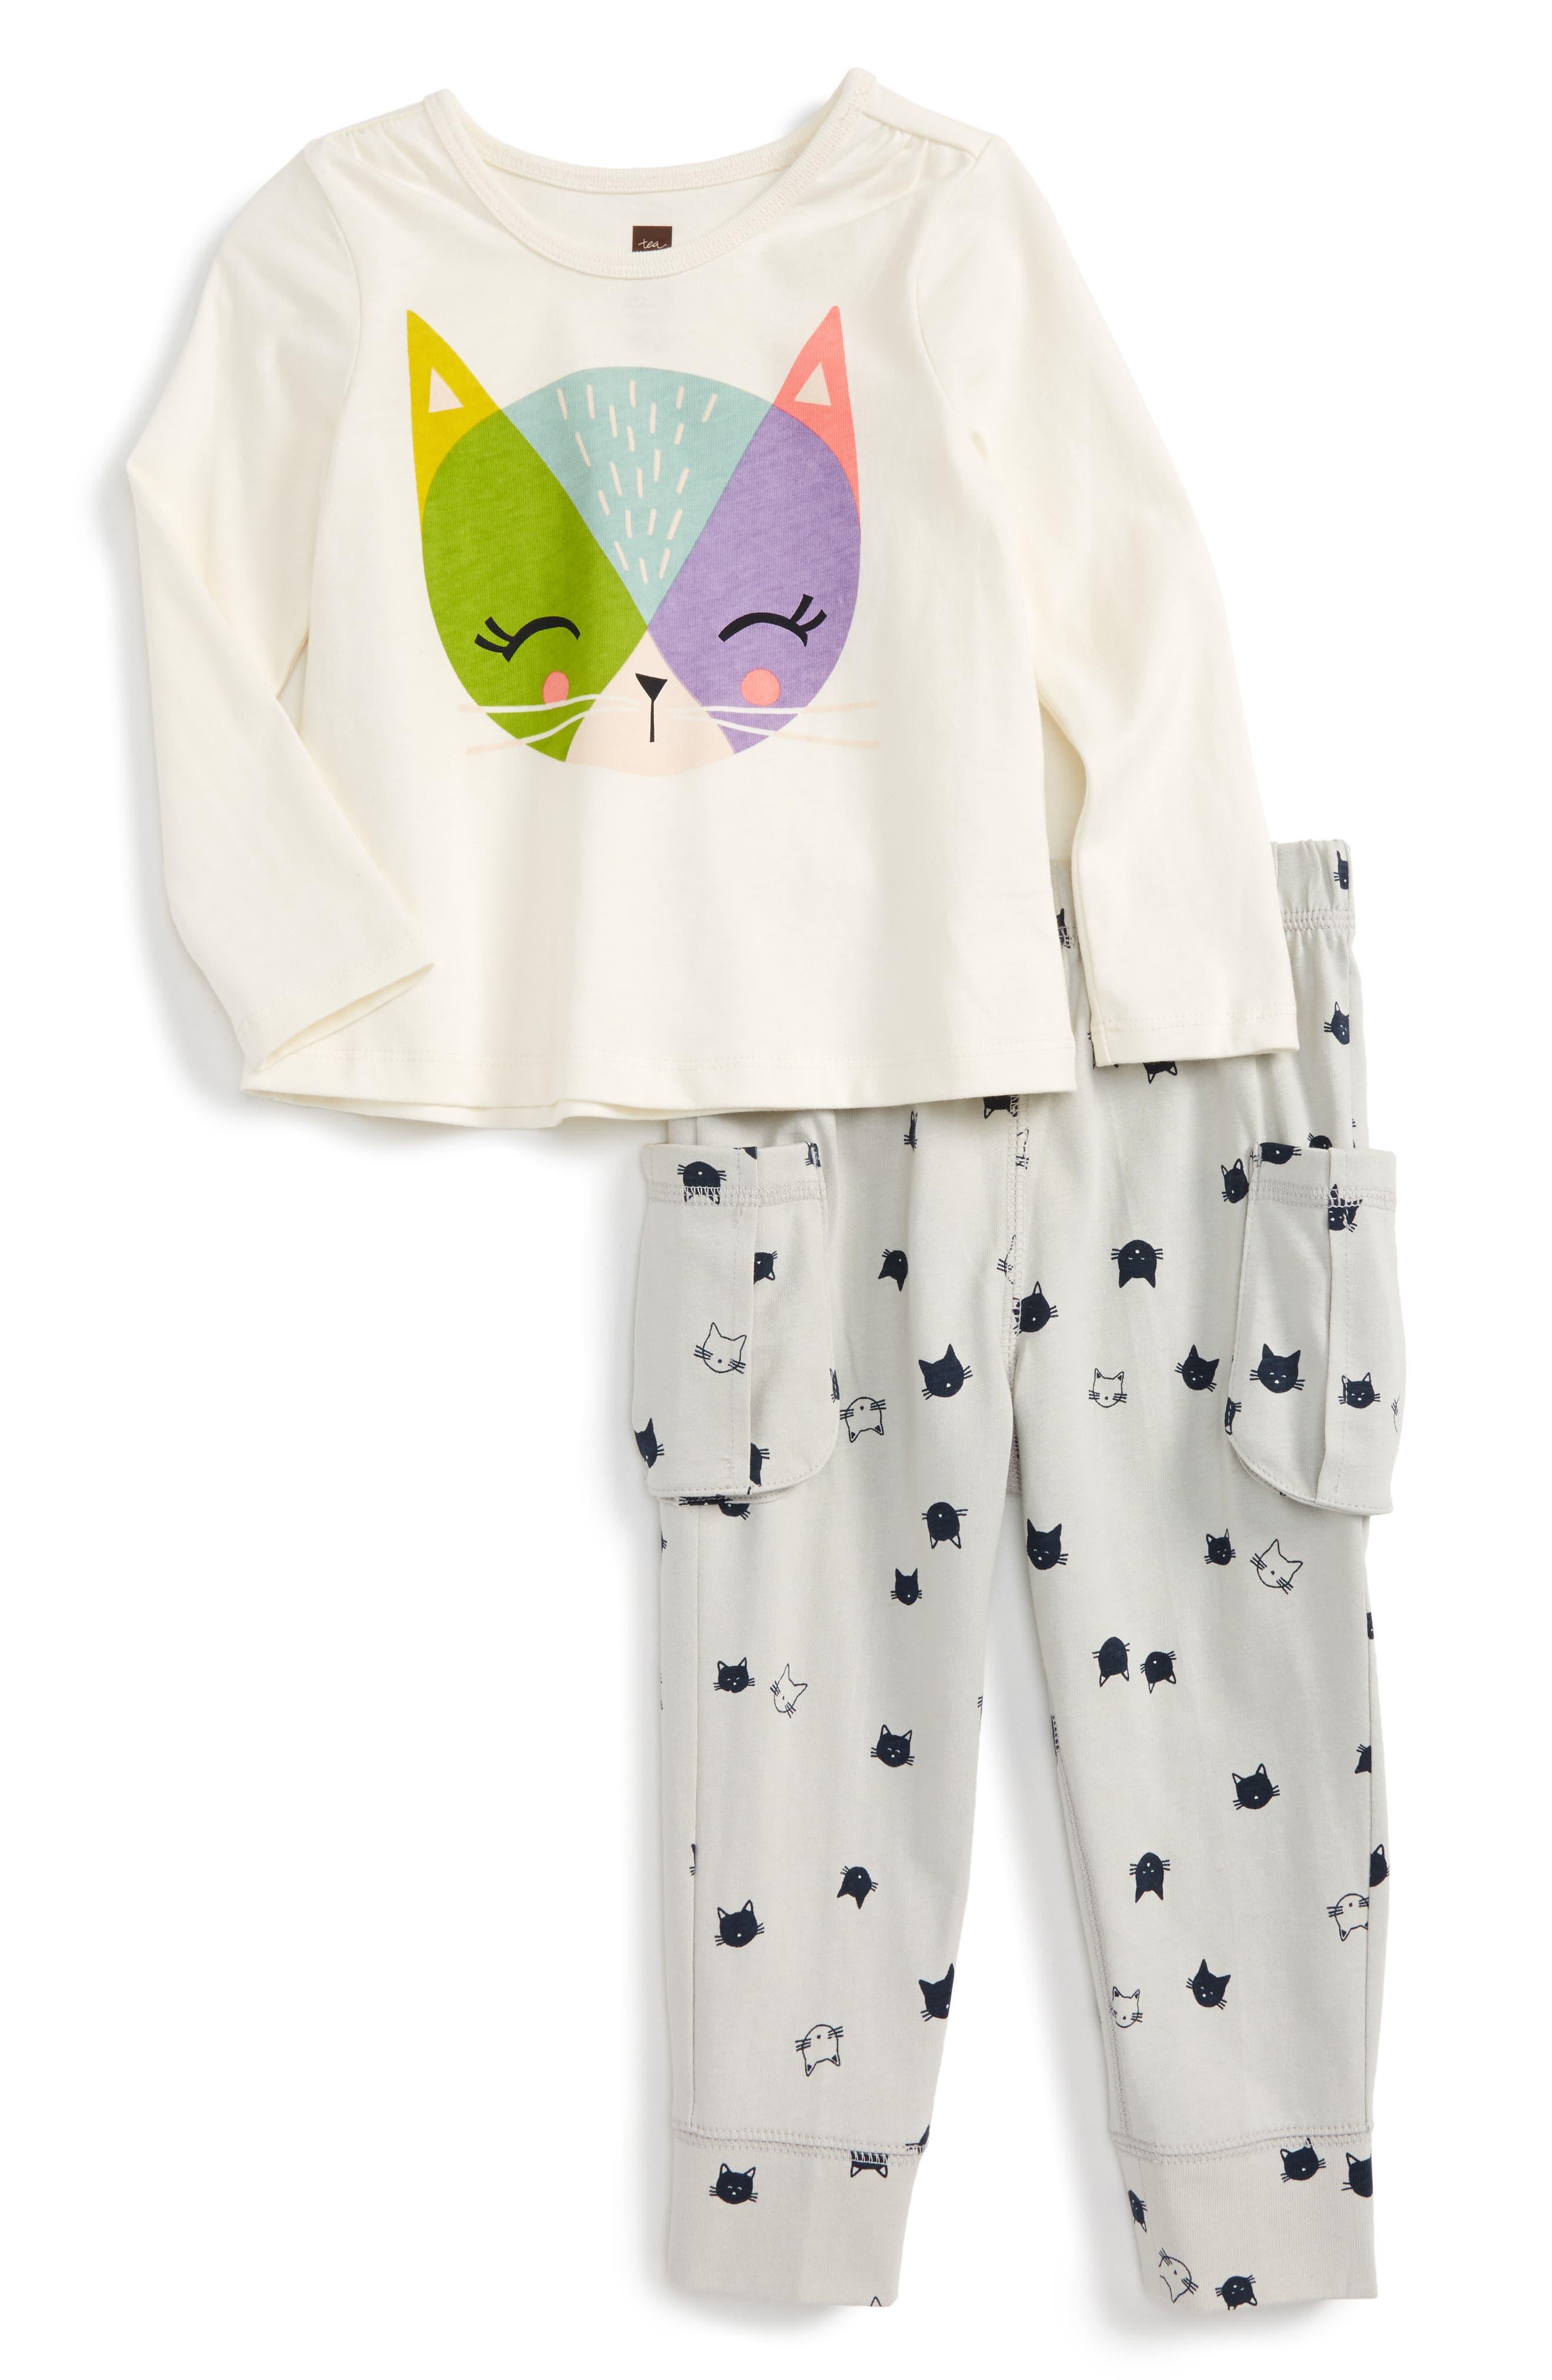 Main Image - Tea Collection Hamish McHamish Graphic Top & Sweatpants (Baby Girls)